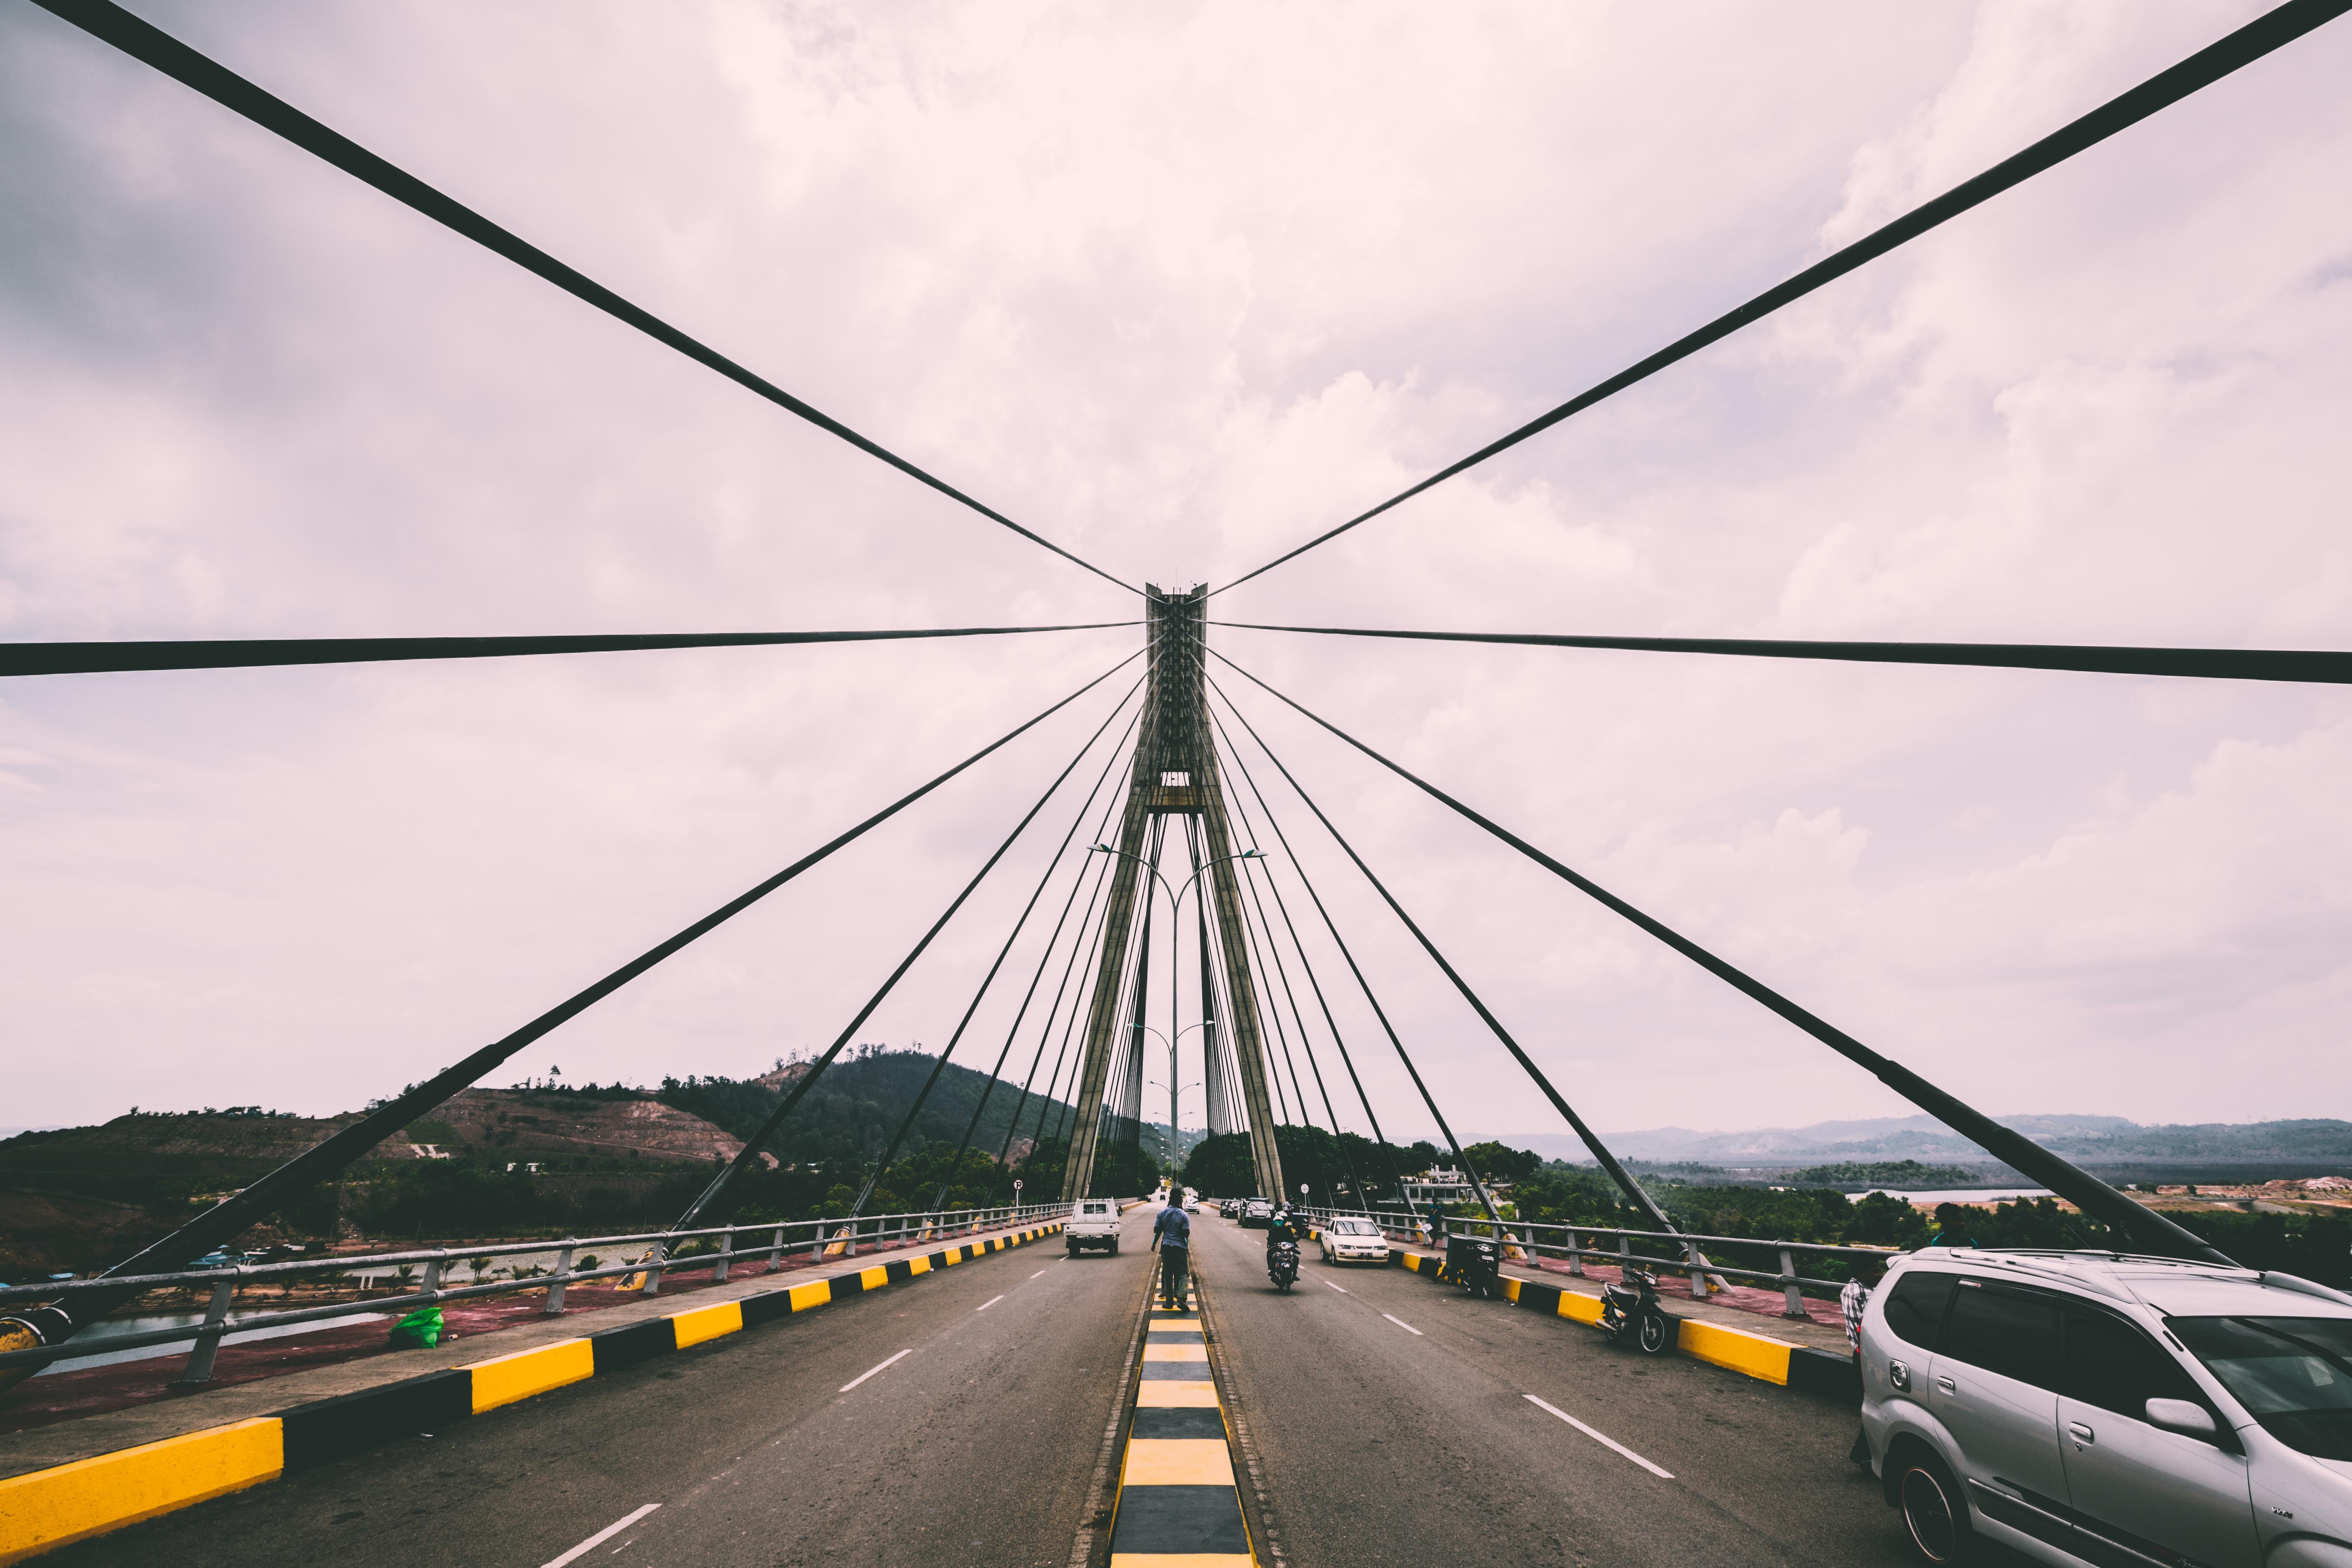 Highway traffic crossing the suspension bridge.